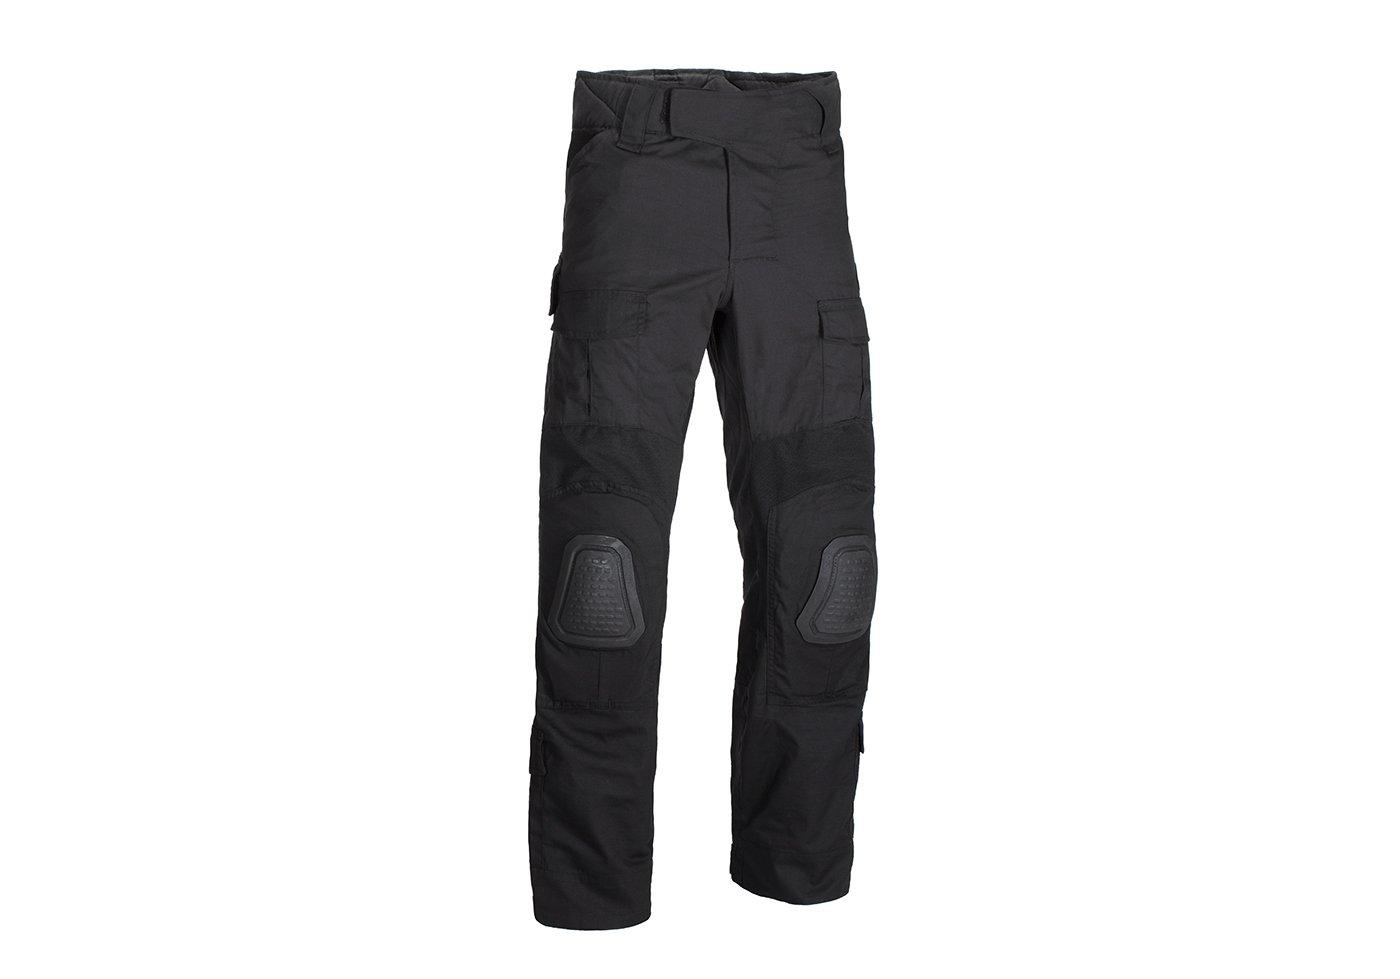 Invader Gear Predator Combat Pants Trousers Black